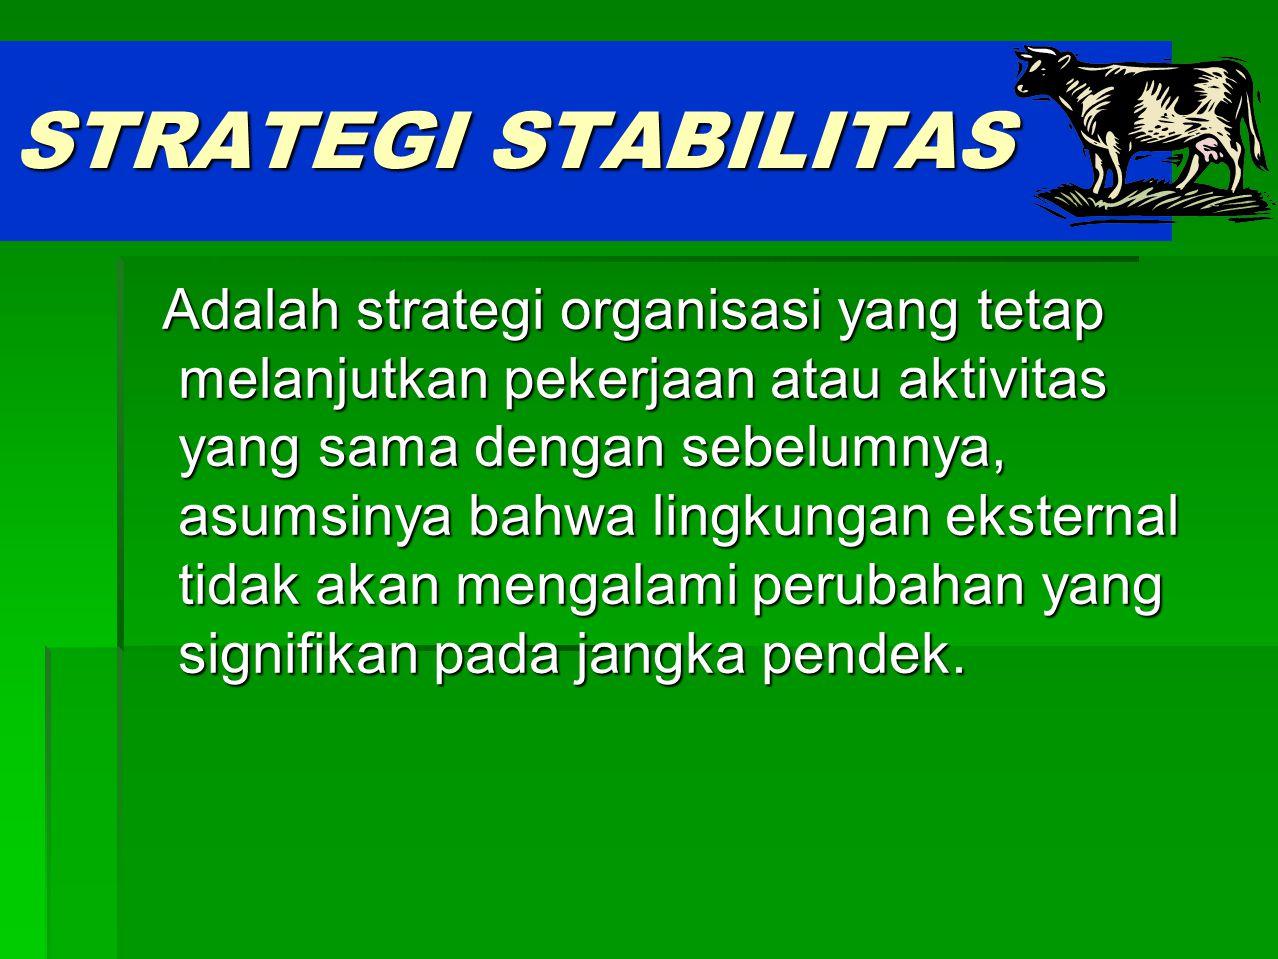 STRATEGI STABILITAS